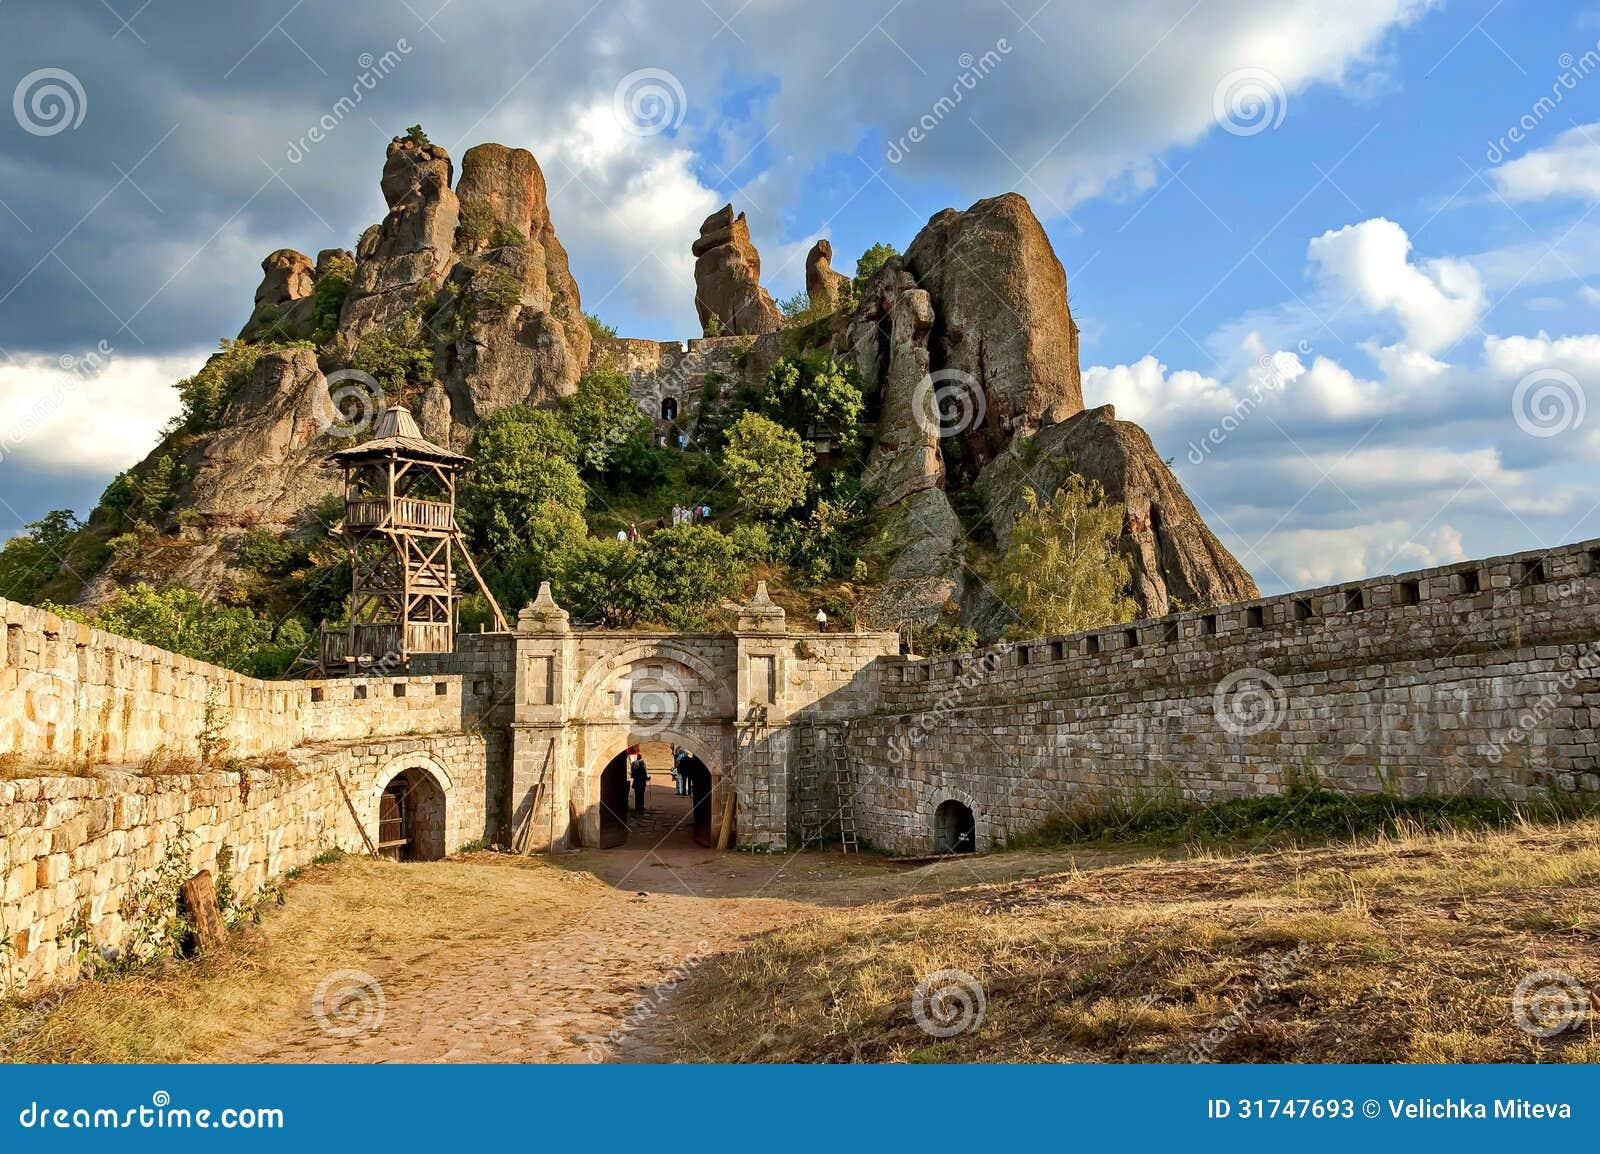 Belogradchik Rocks Fortress, Bulgaria, Europe Stock Photos - Image ...